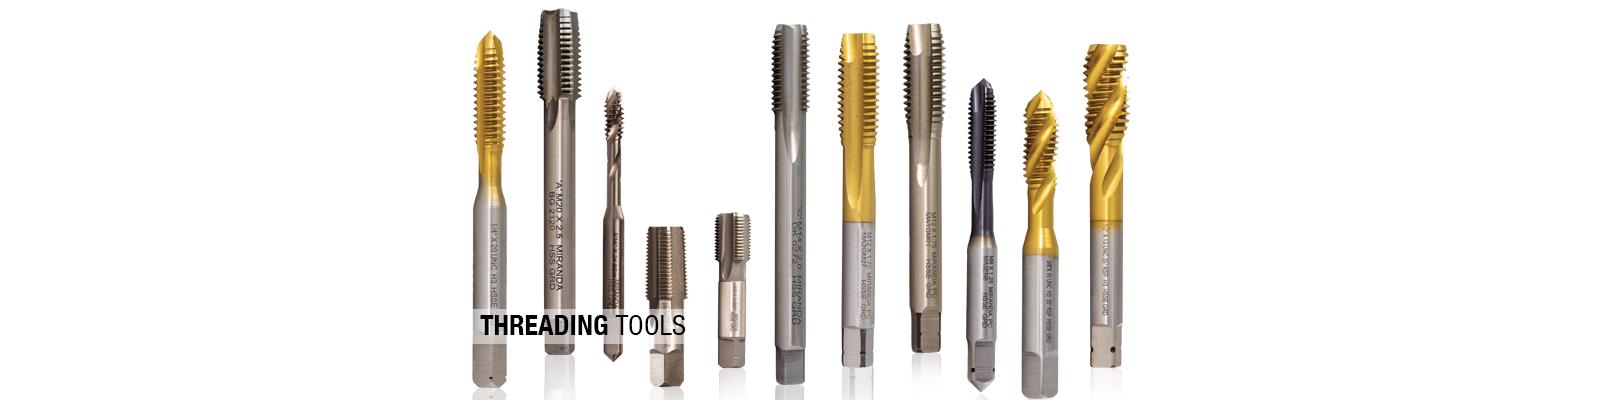 Threading Tools